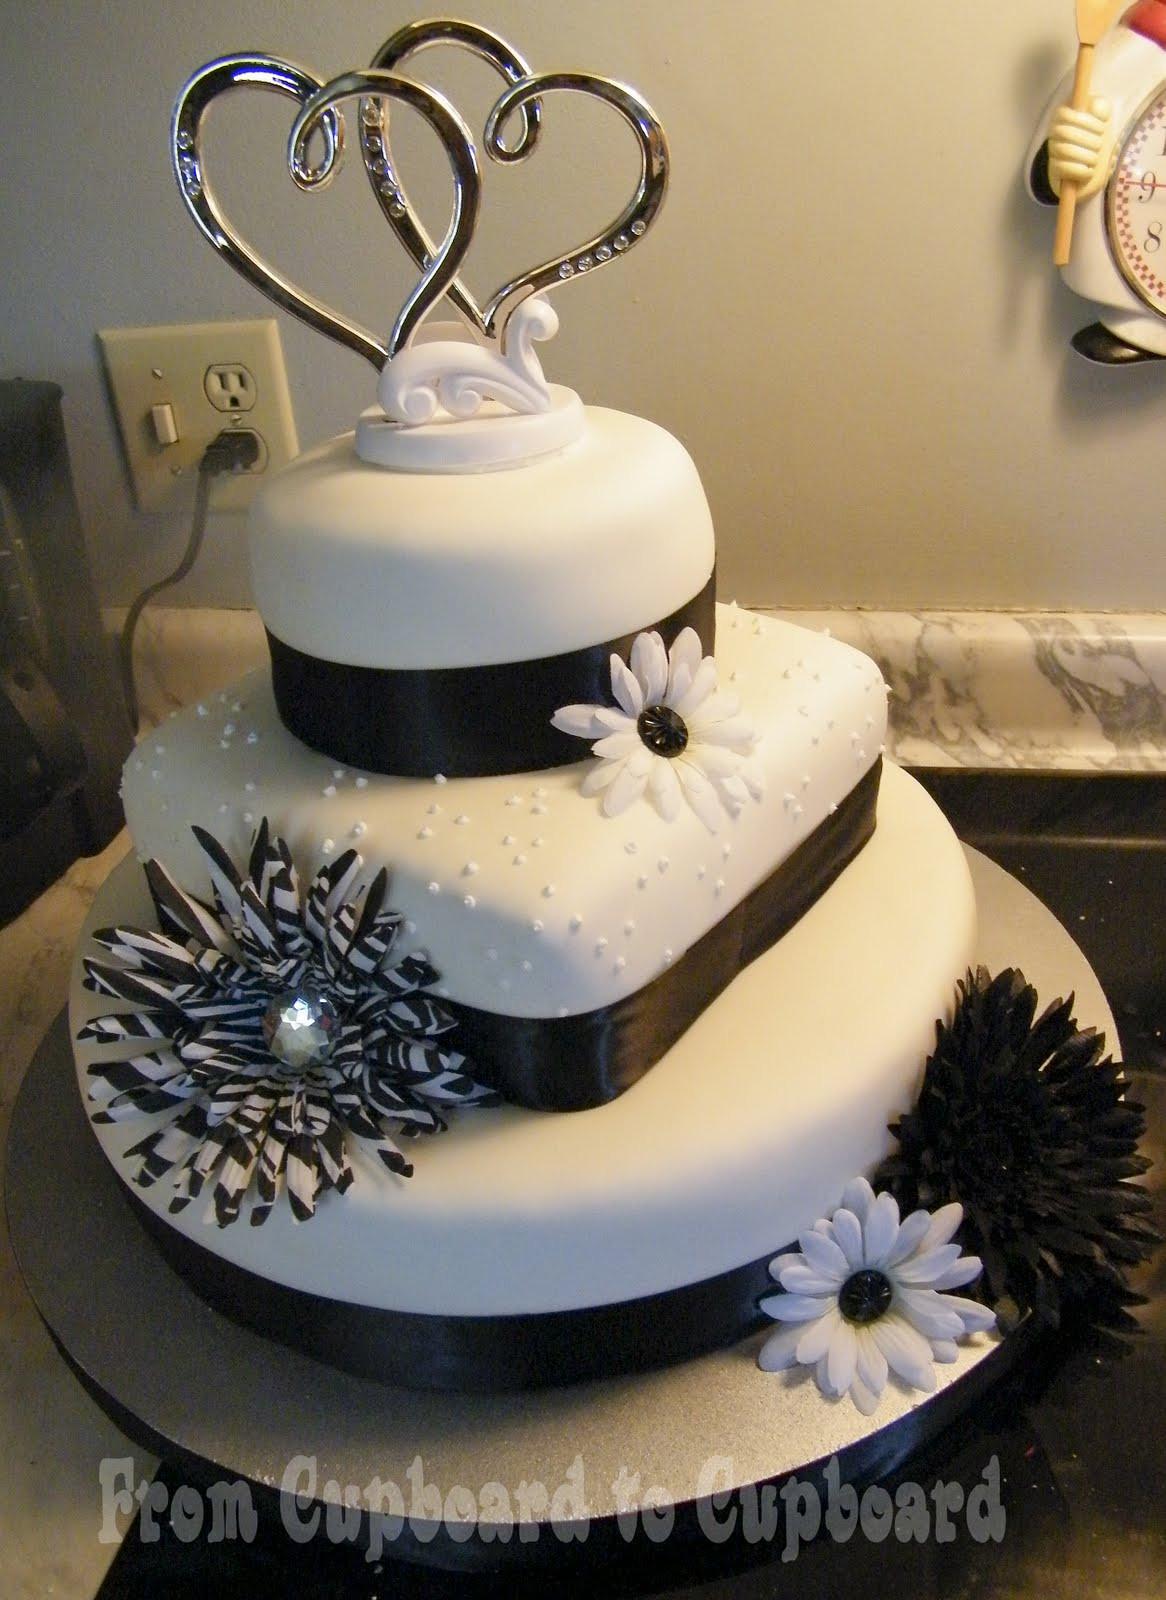 Sam Club Bakery Wedding Cakes  Decorating Tips Hummingbird Bakery Videos & Tips